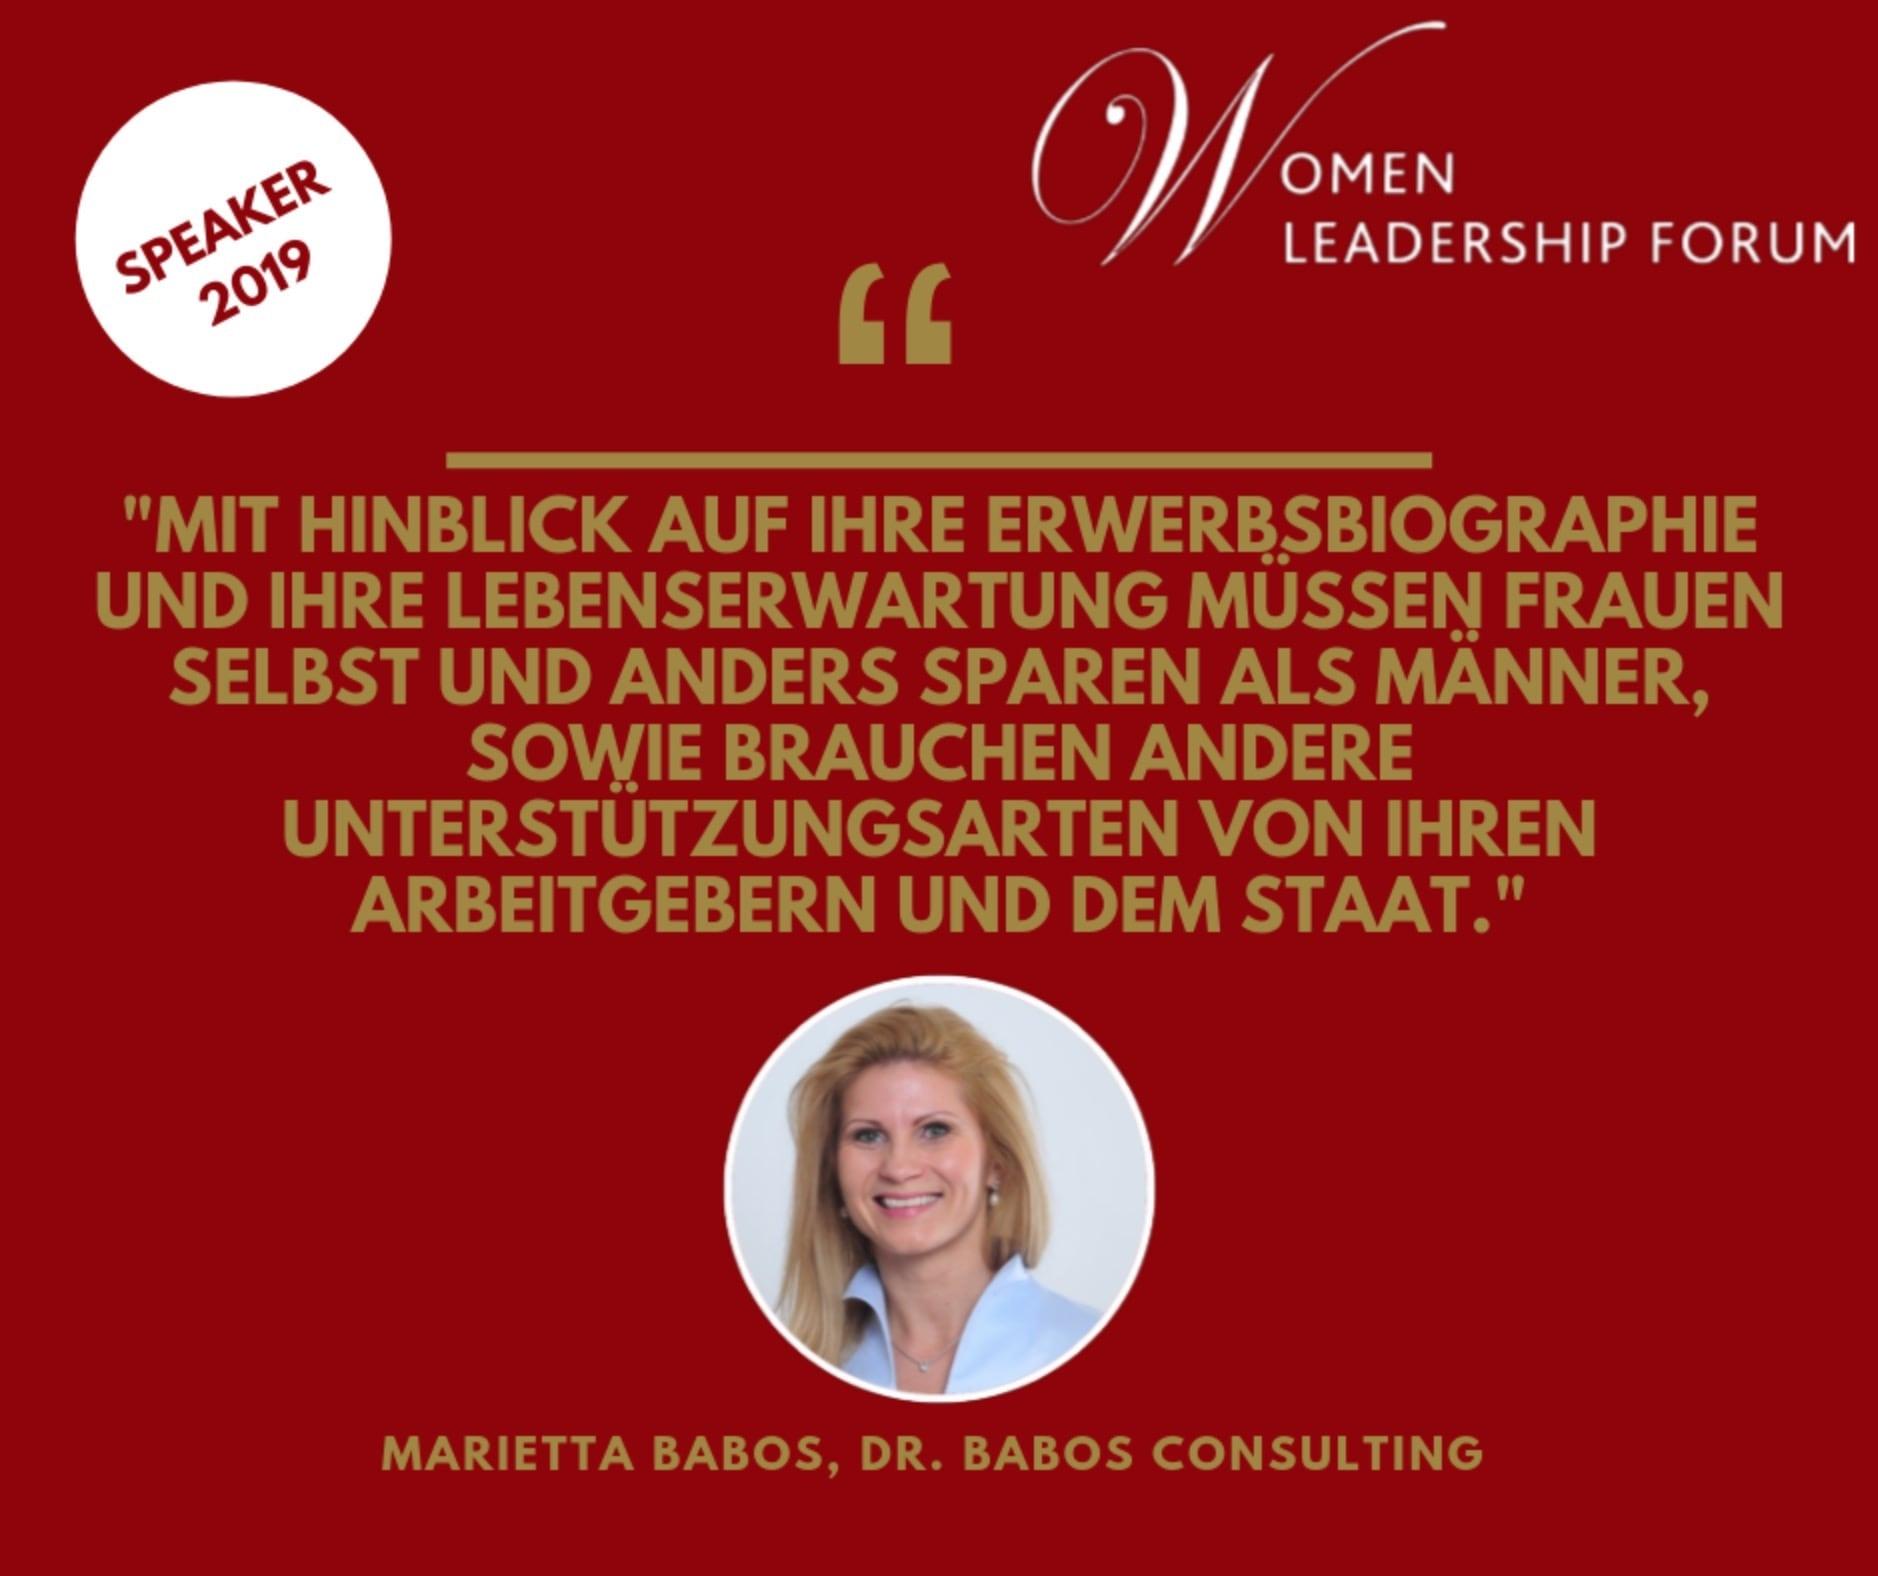 Woman Leadership Forum 7